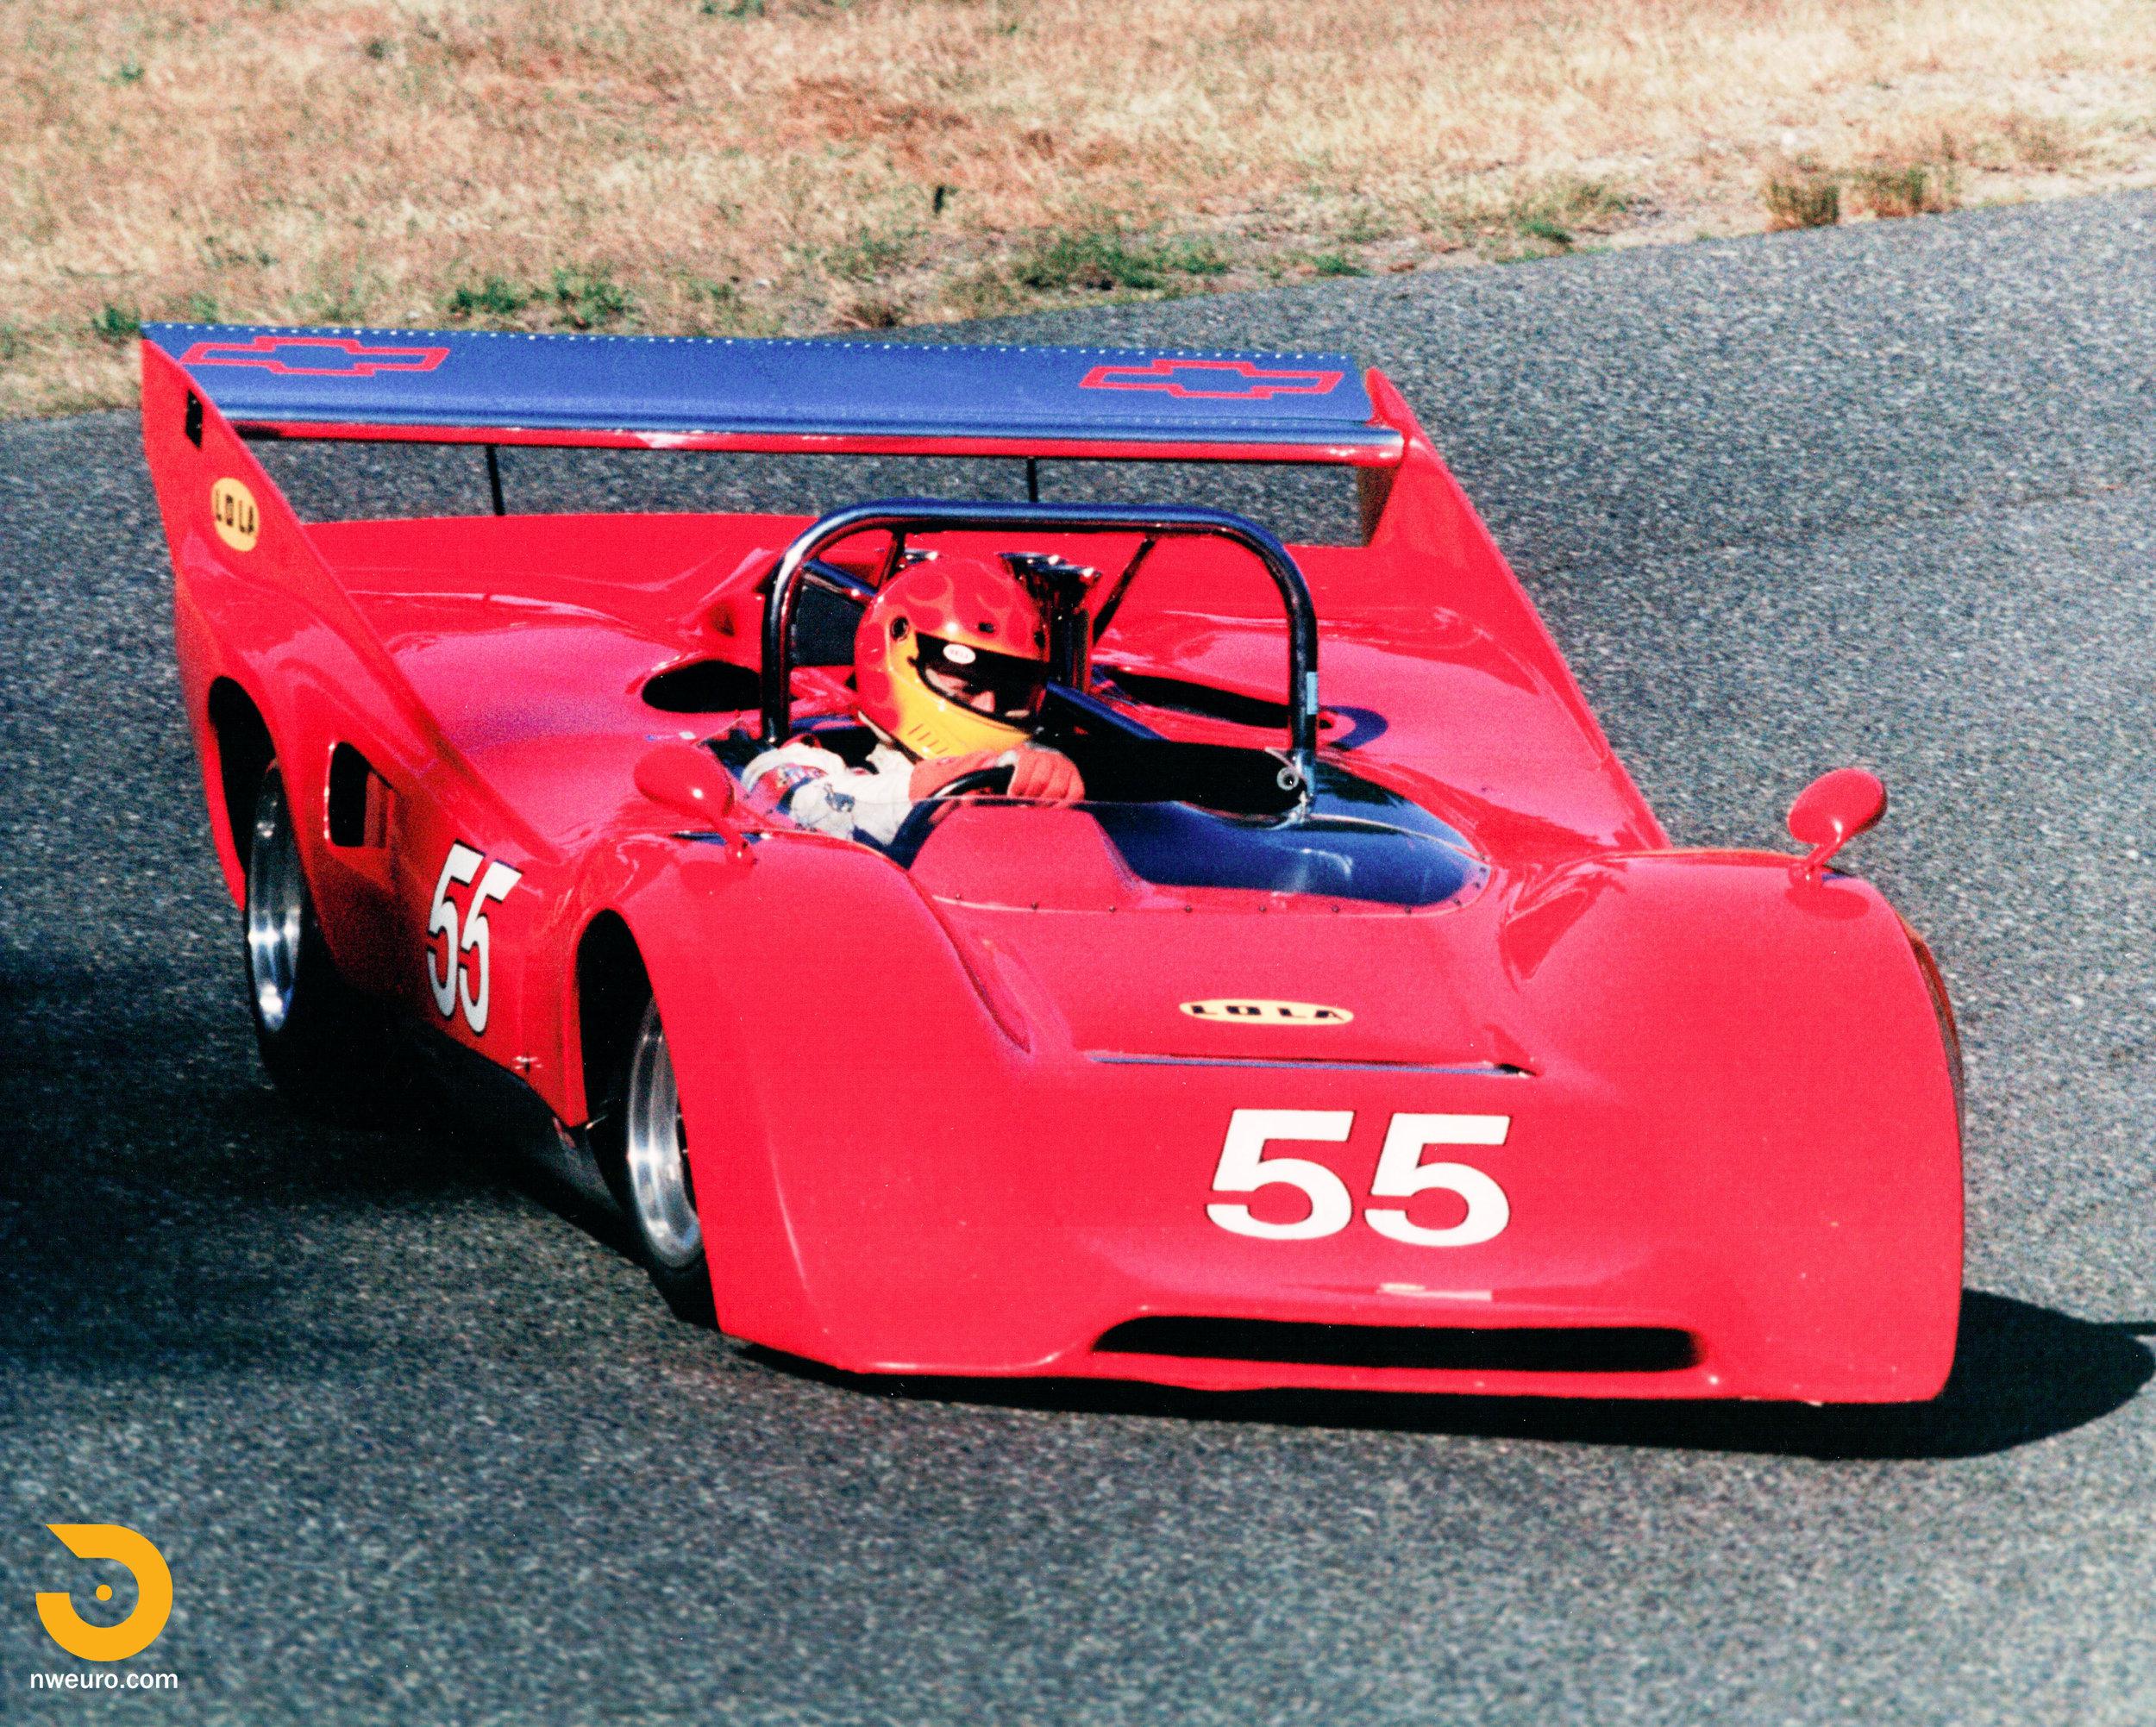 1969 Lola T162 Can-Am Race Car Action Shots-5.jpg